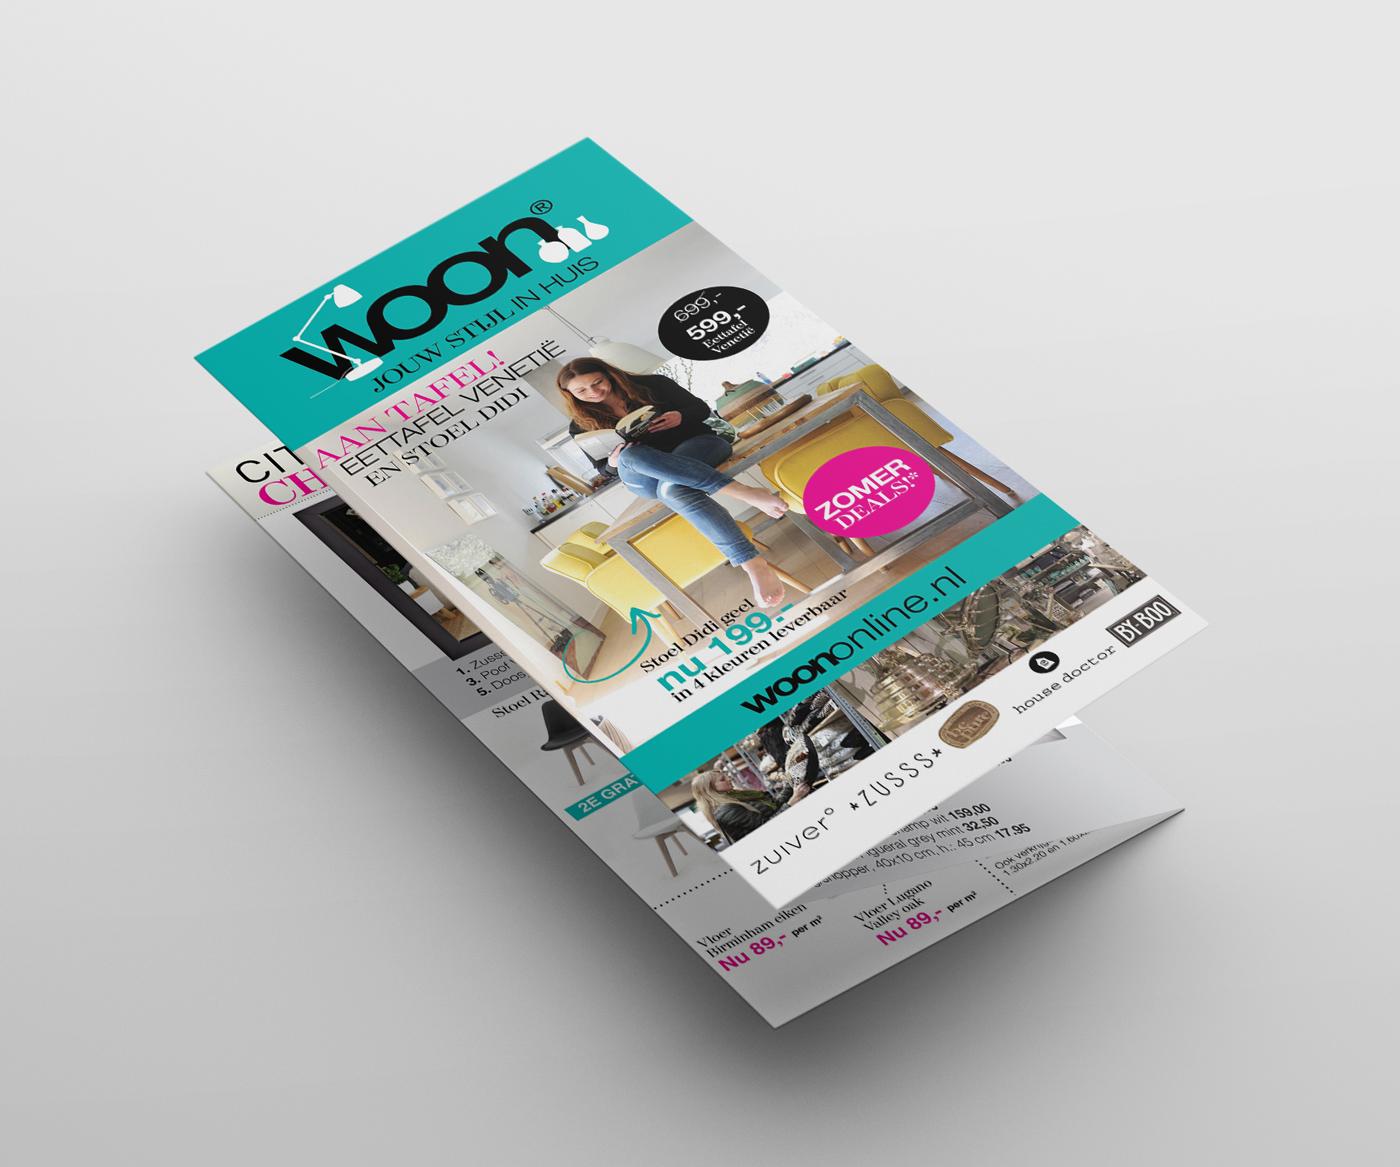 Design folder Woon